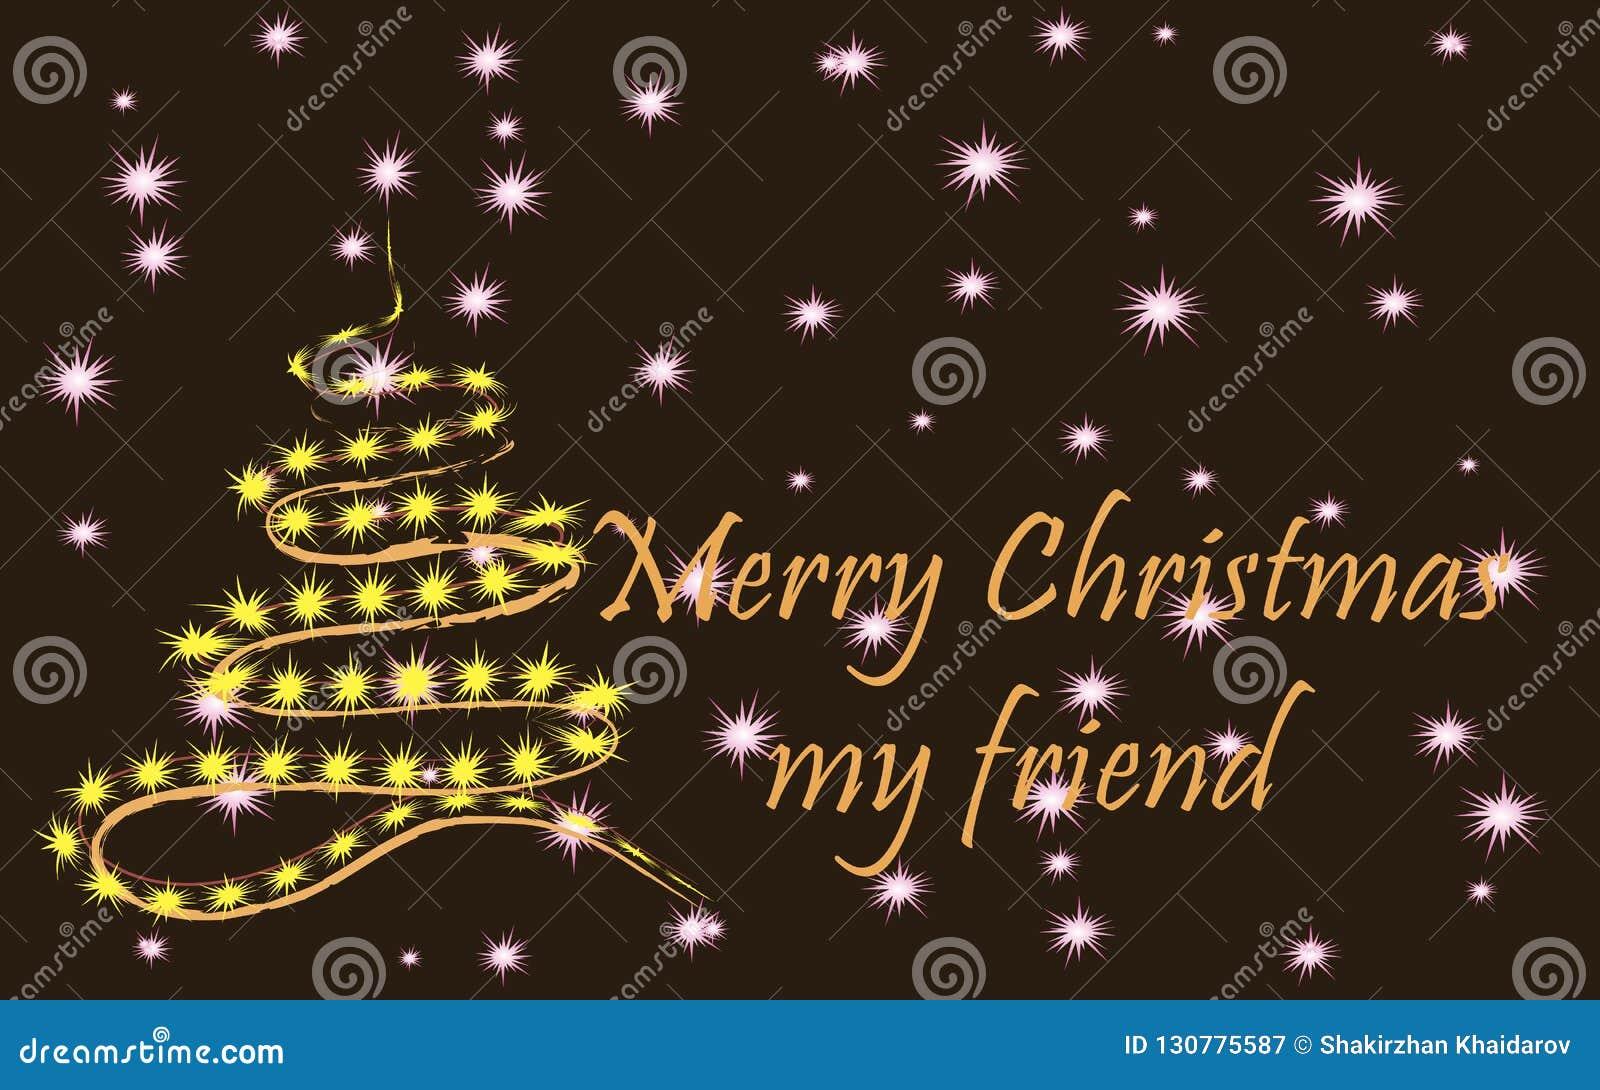 Merry Christmas My Friend.Merry Christmas My Friend A Stylish Christmas Tree On A